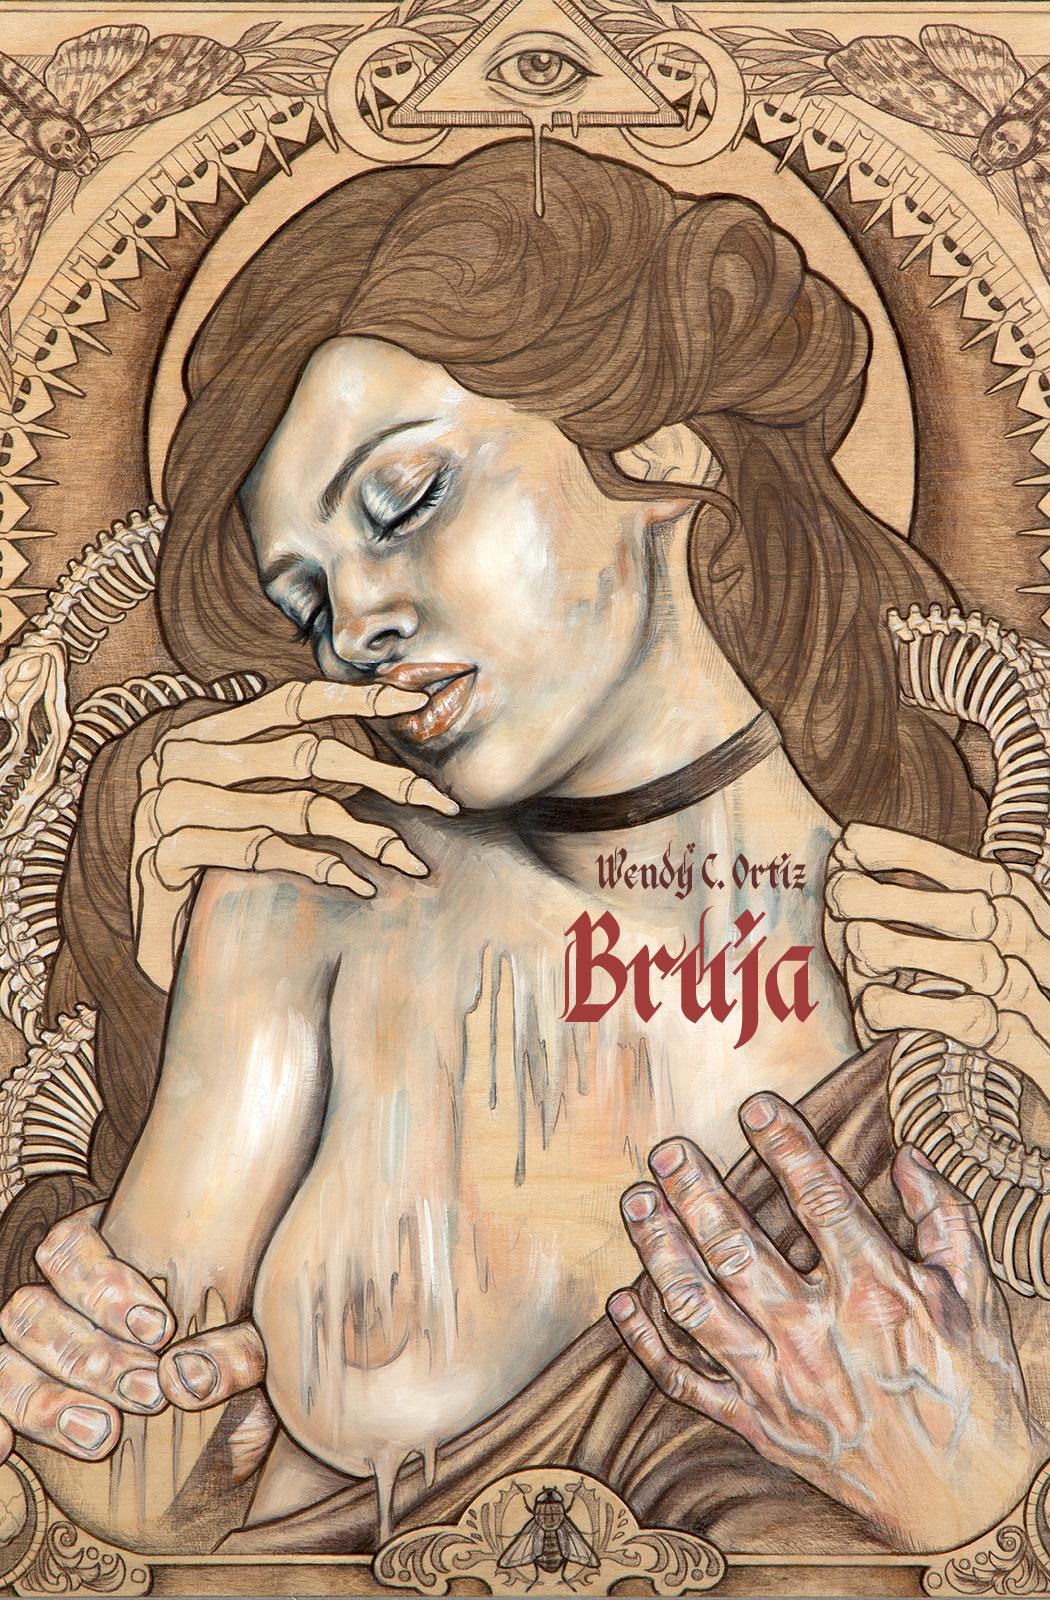 Bruja by Wendy C. Ortiz (Civil Coping Mechanisms, 2016)